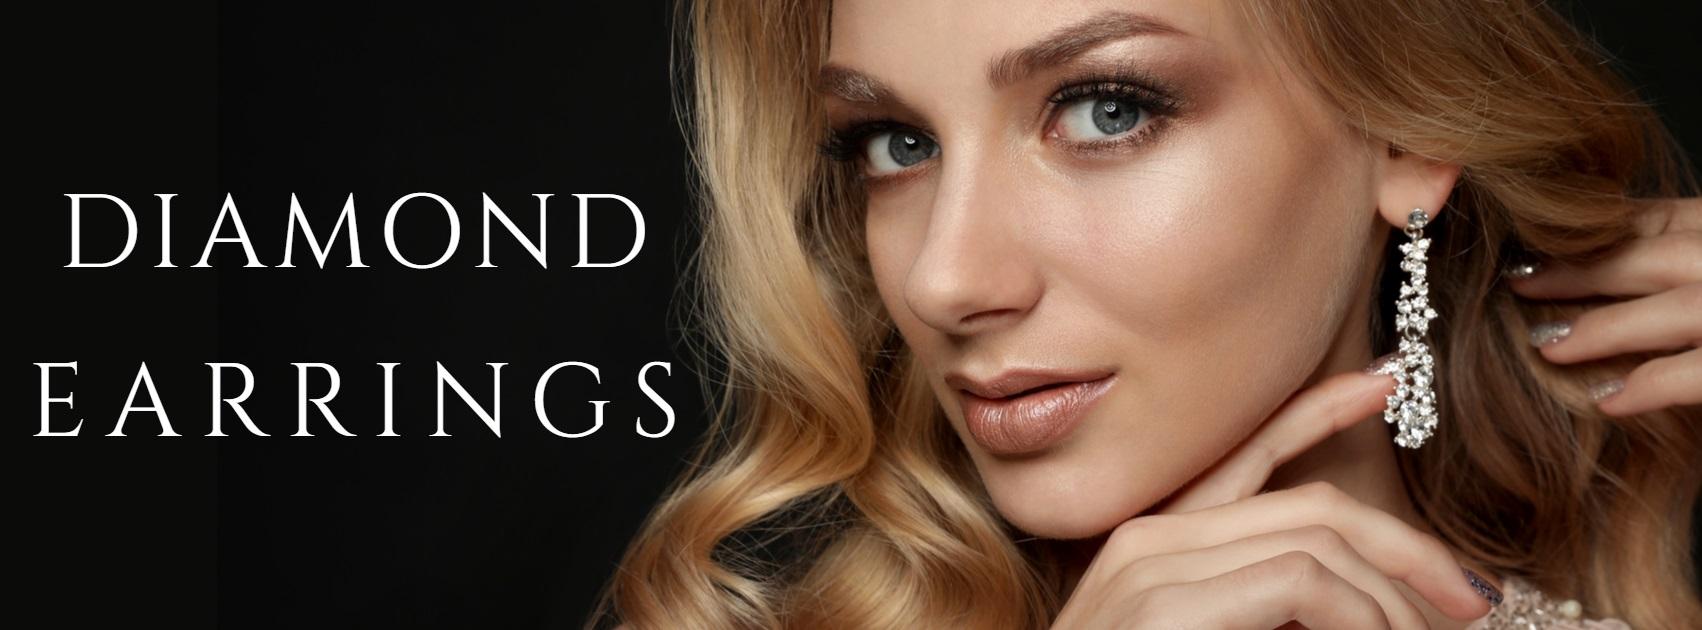 Shop Diamond Earrings - Antwerp Diamonds of Buckhead Georgia